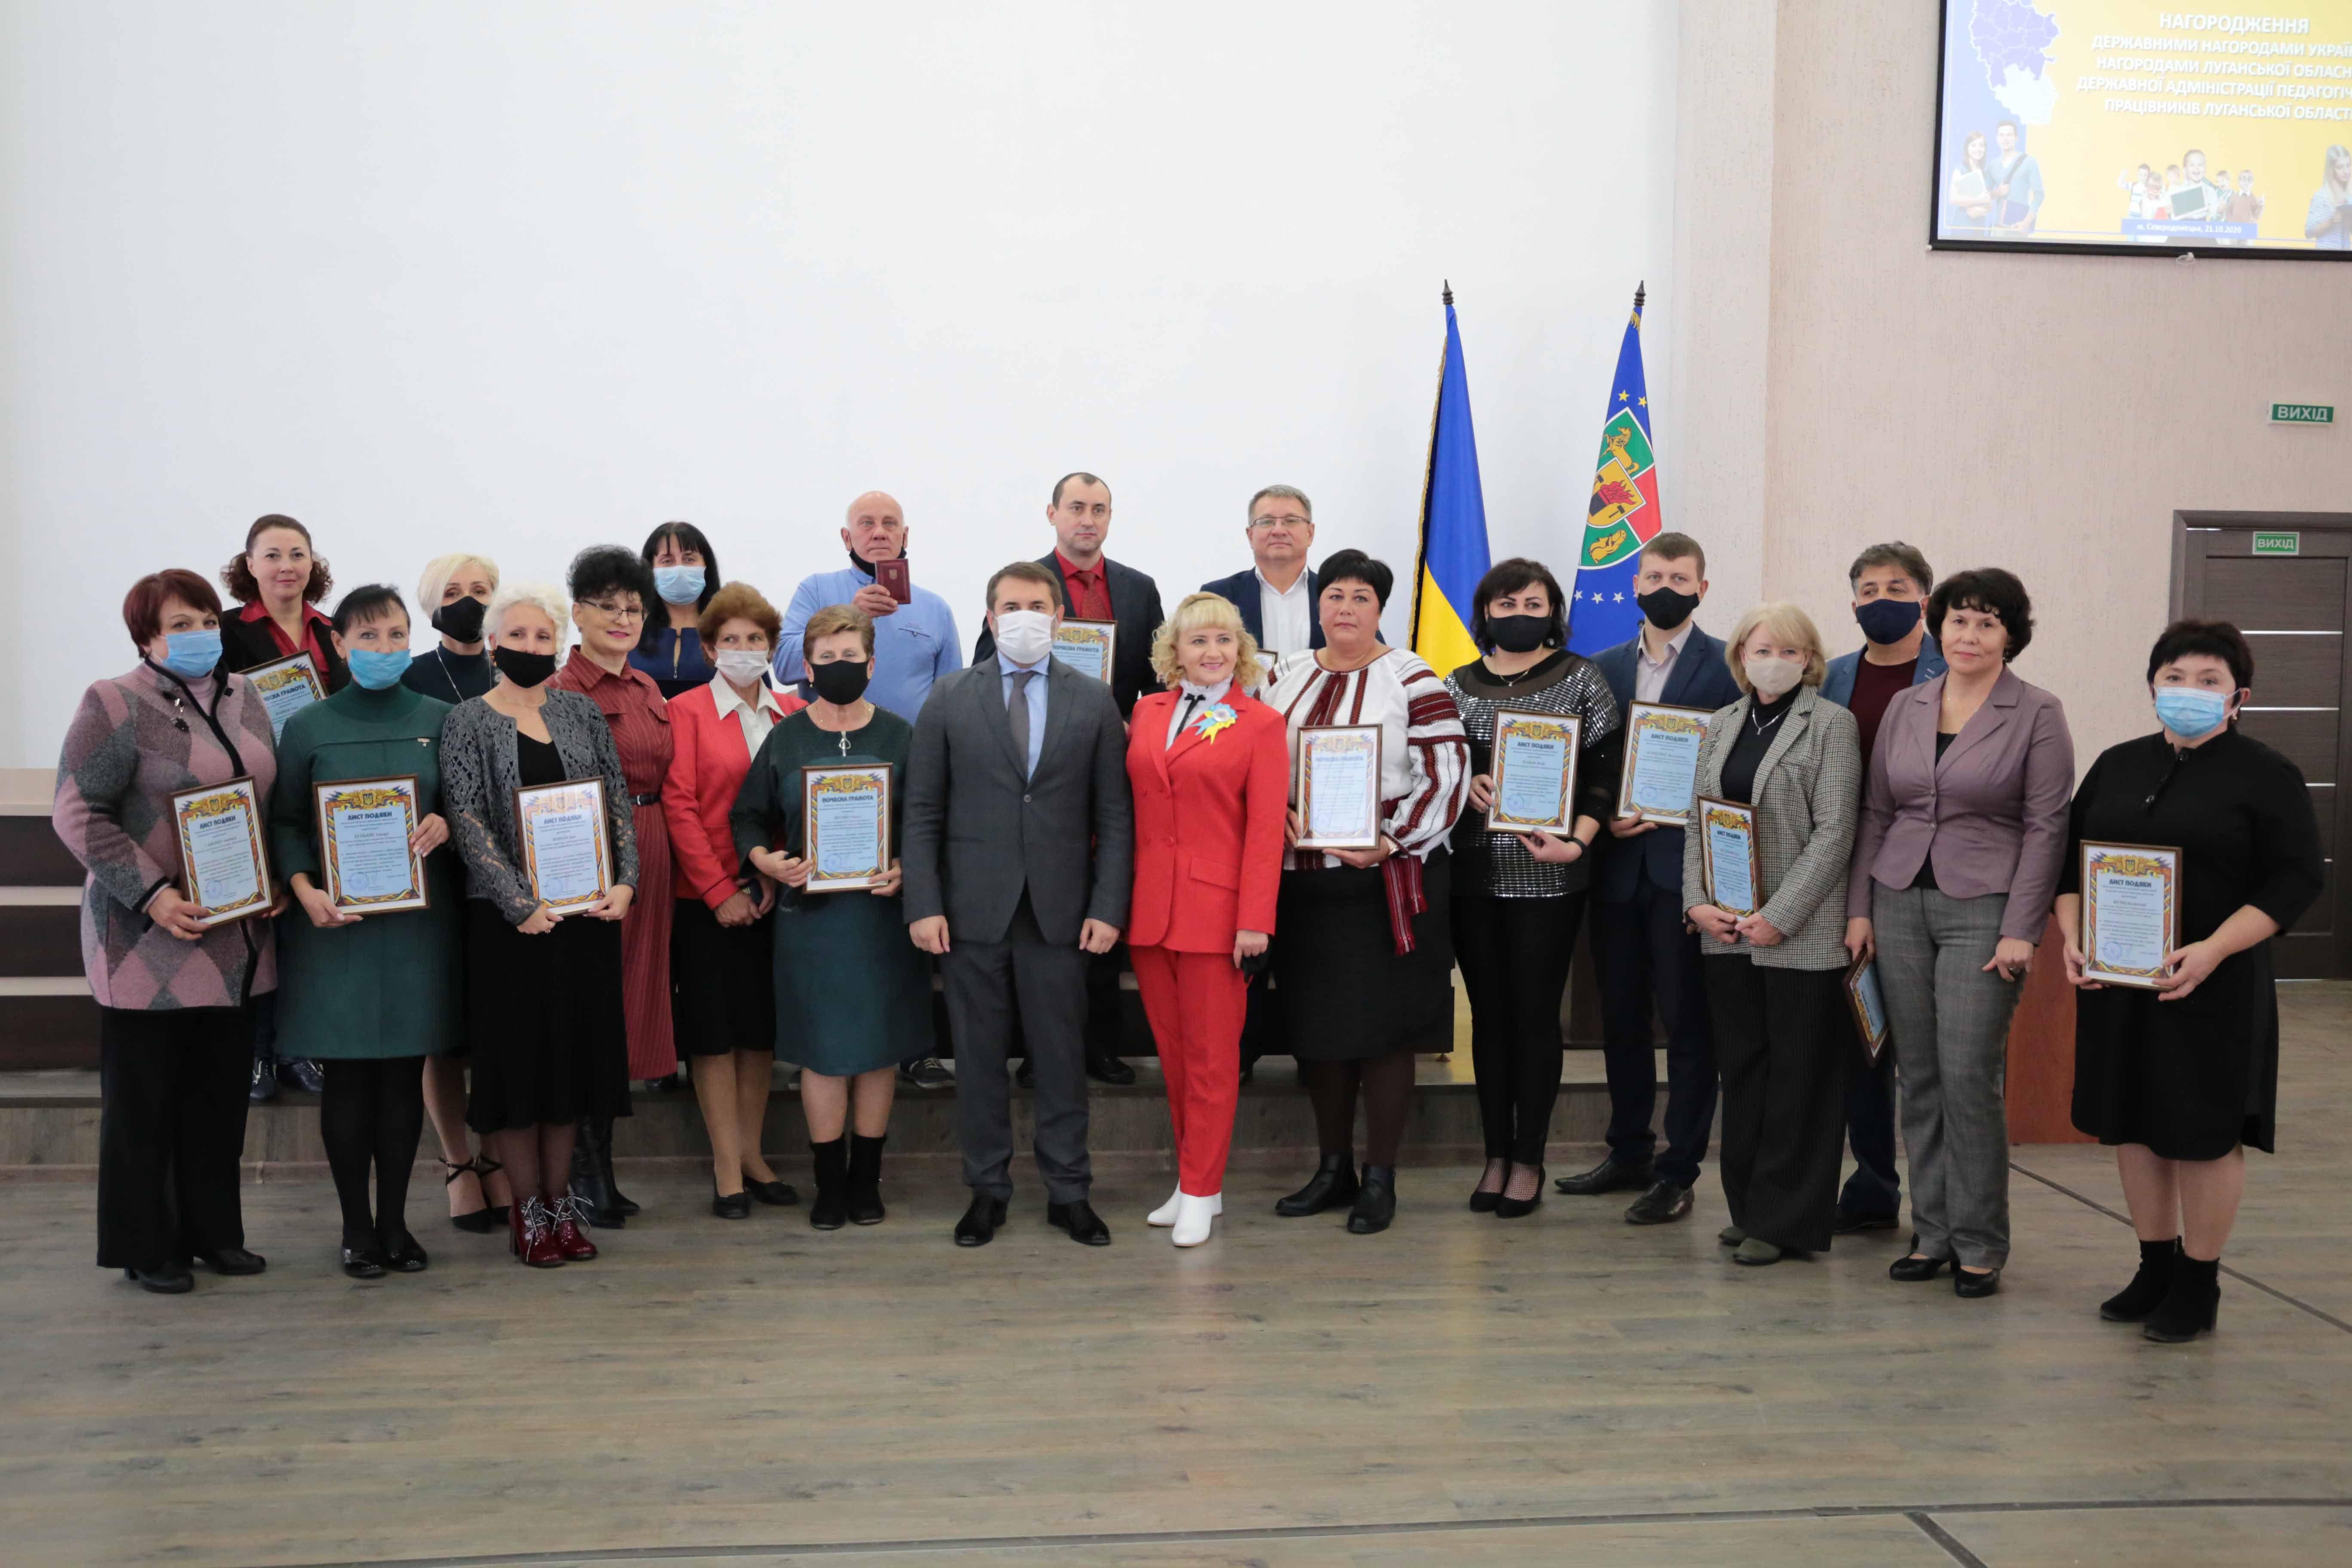 Луганщина: Педагогам вручили награды